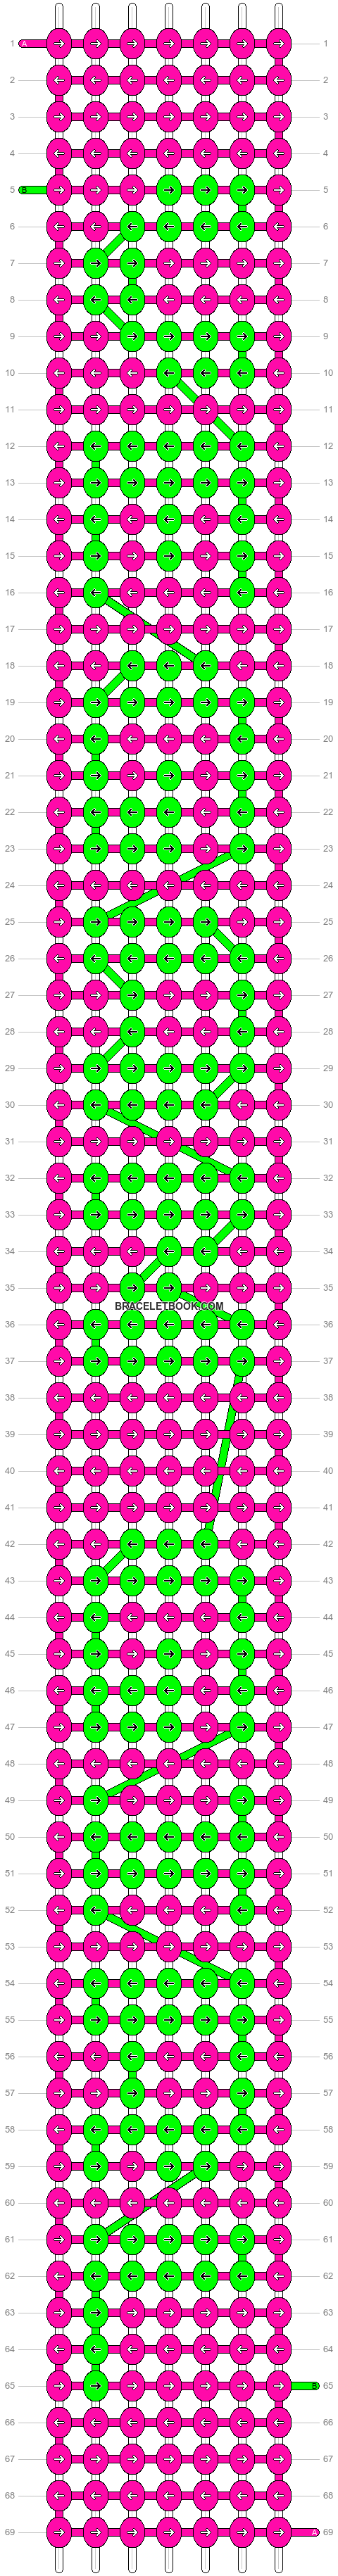 Alpha pattern #6120 pattern